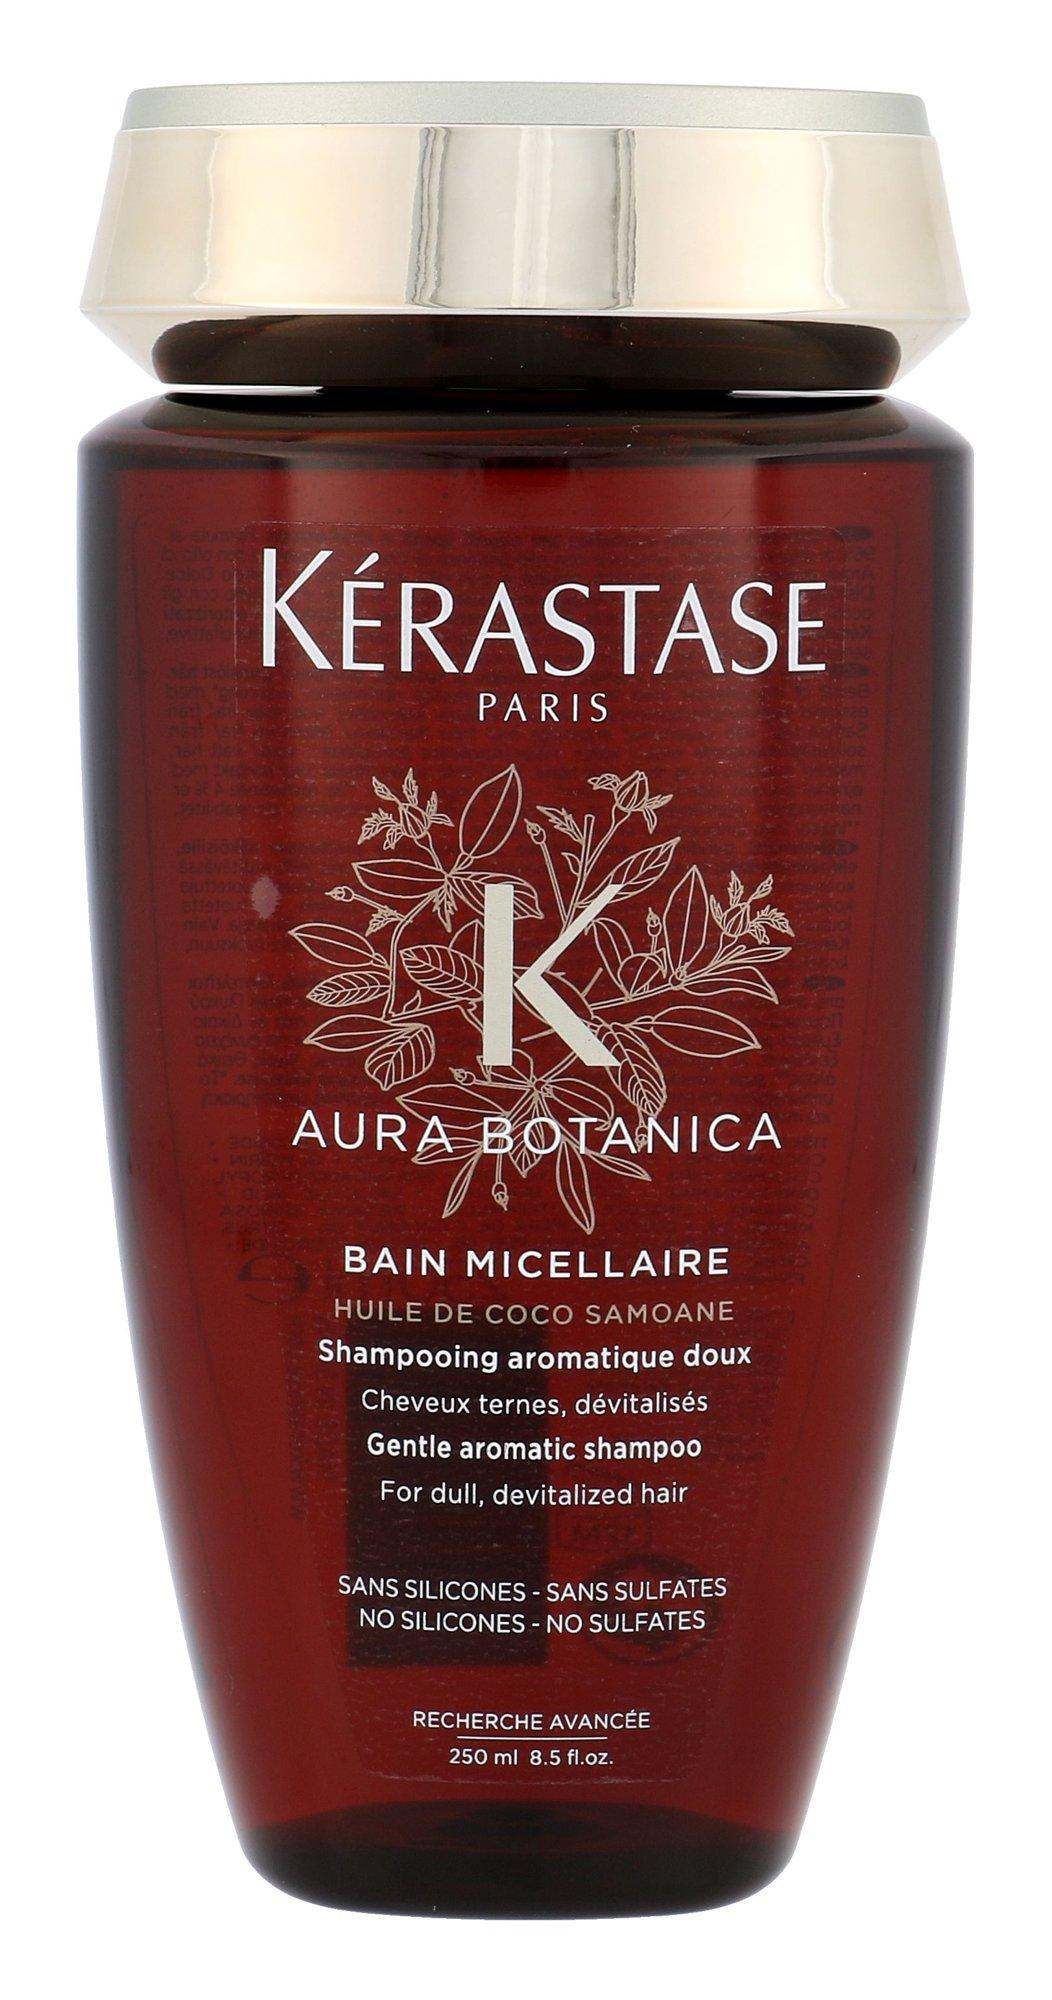 Kérastase Aura Botanica Cosmetic 250ml